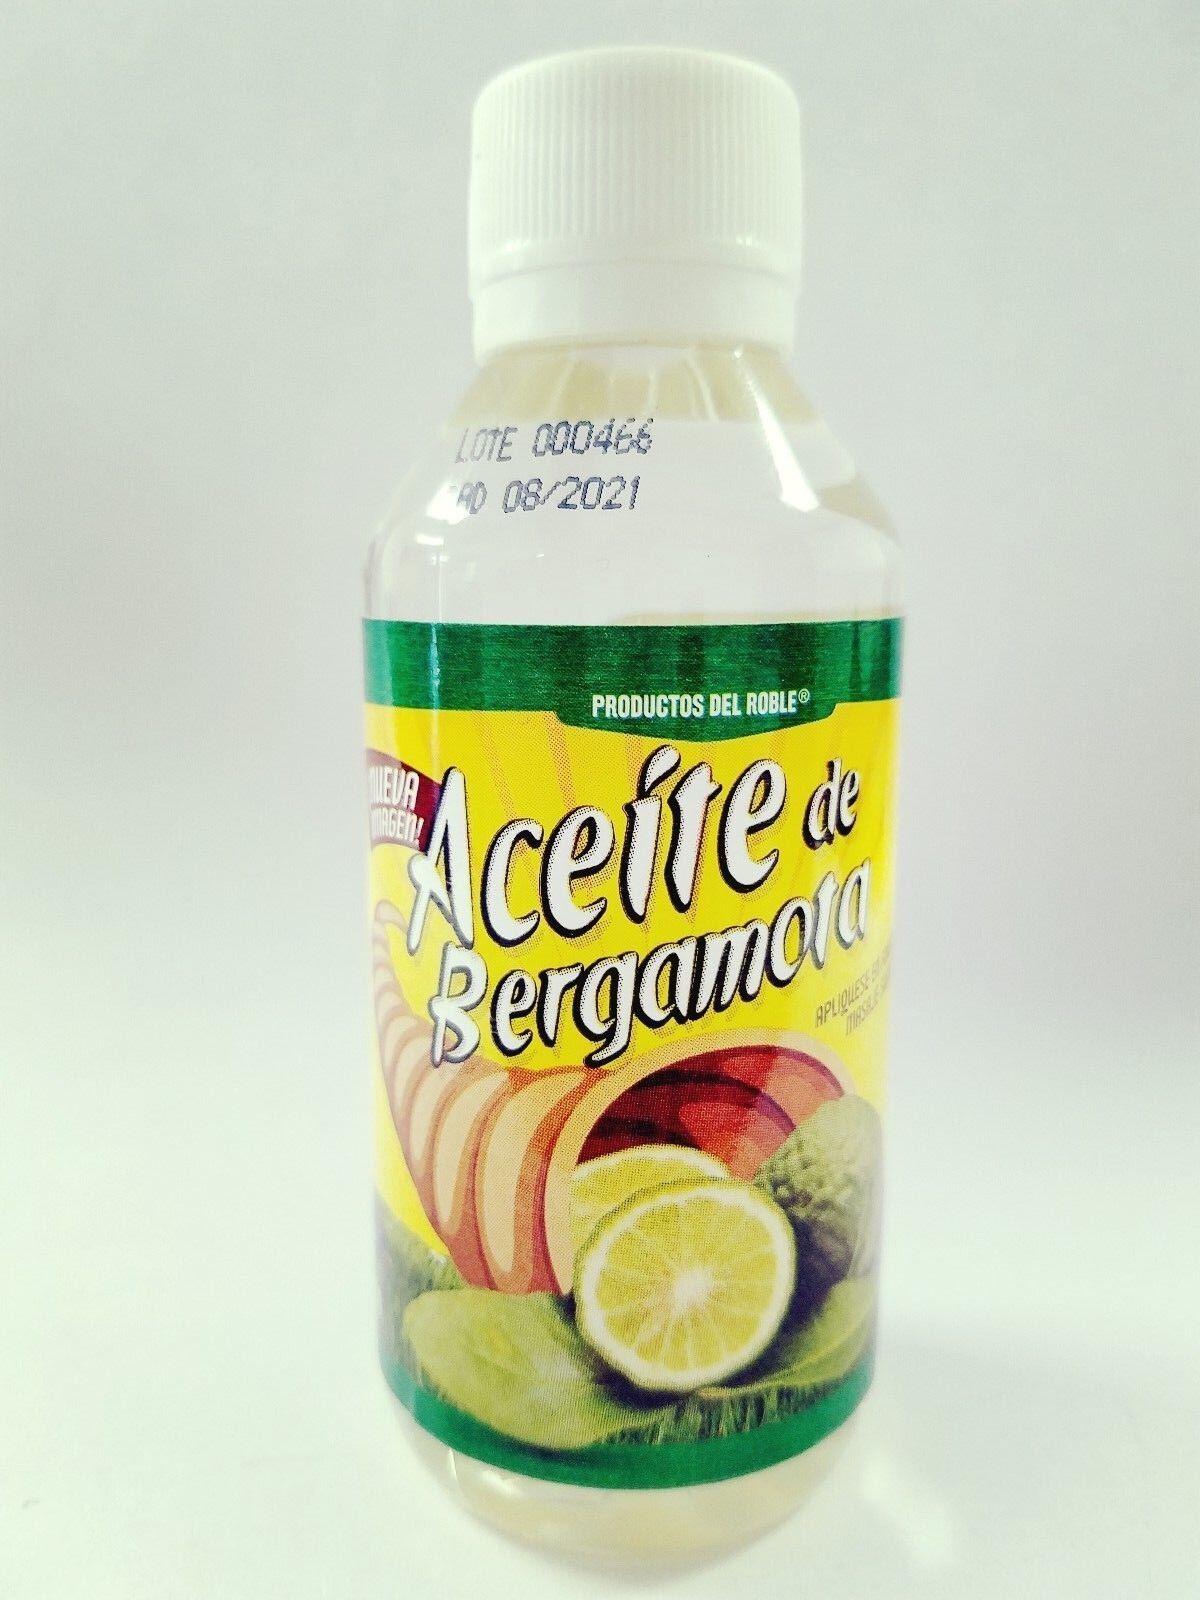 ACEITE DE BERGAMOTA 100% NATURAL BERGAMOT oil BEARD HAIR MUSTACHE MASSAGE masaje